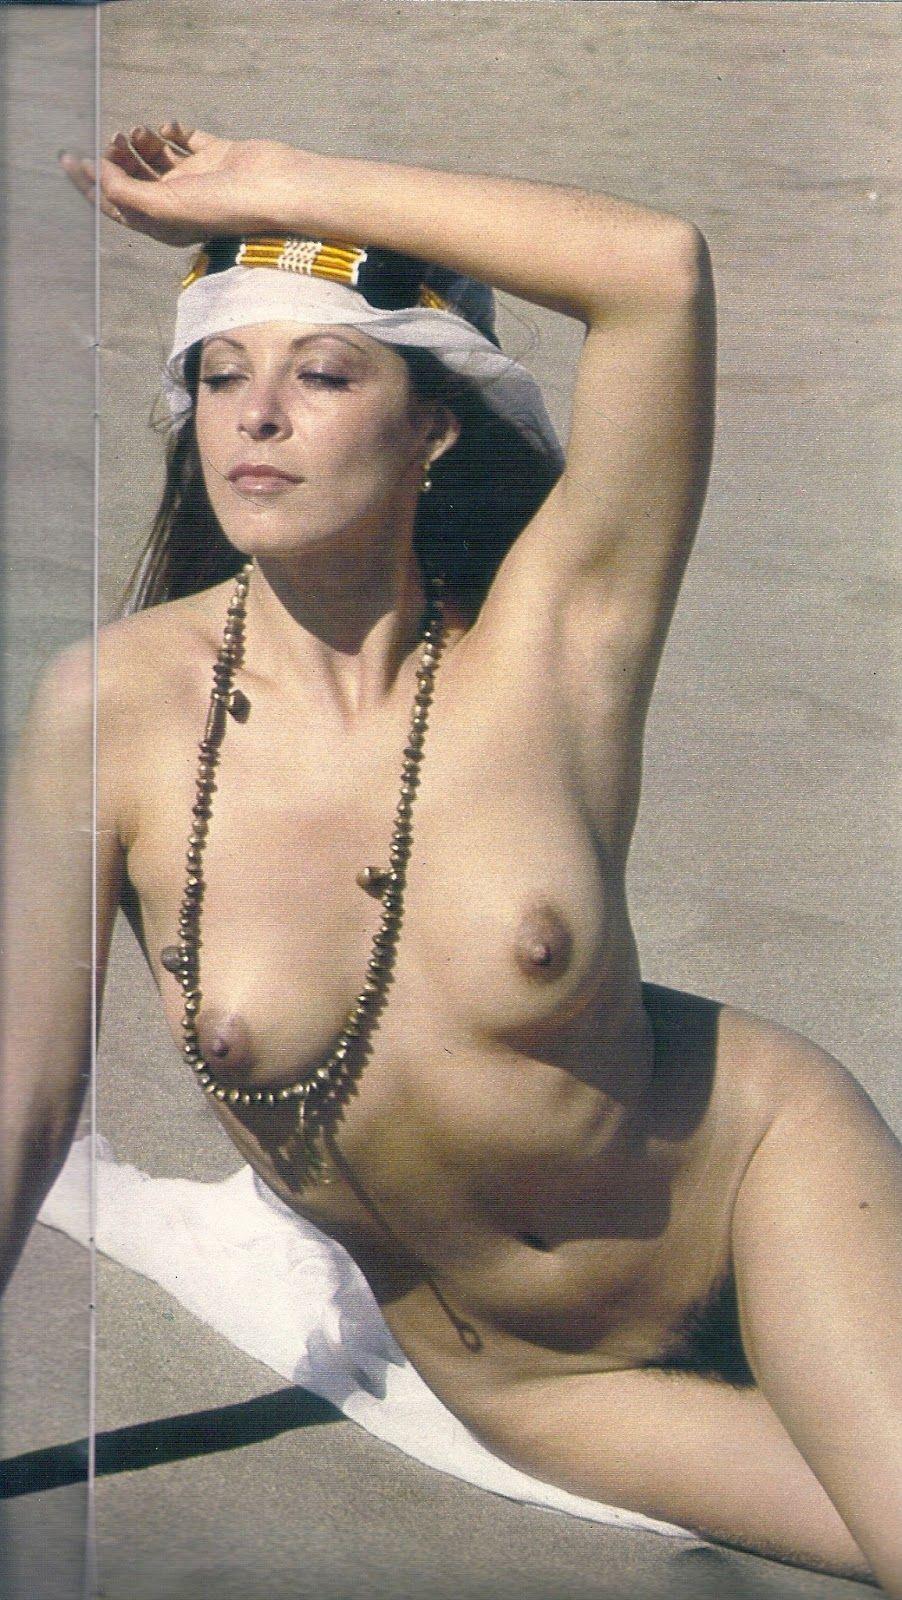 Maria Luisa San Jose Nude Maria Luisa Famosas Españolas Y Famosos